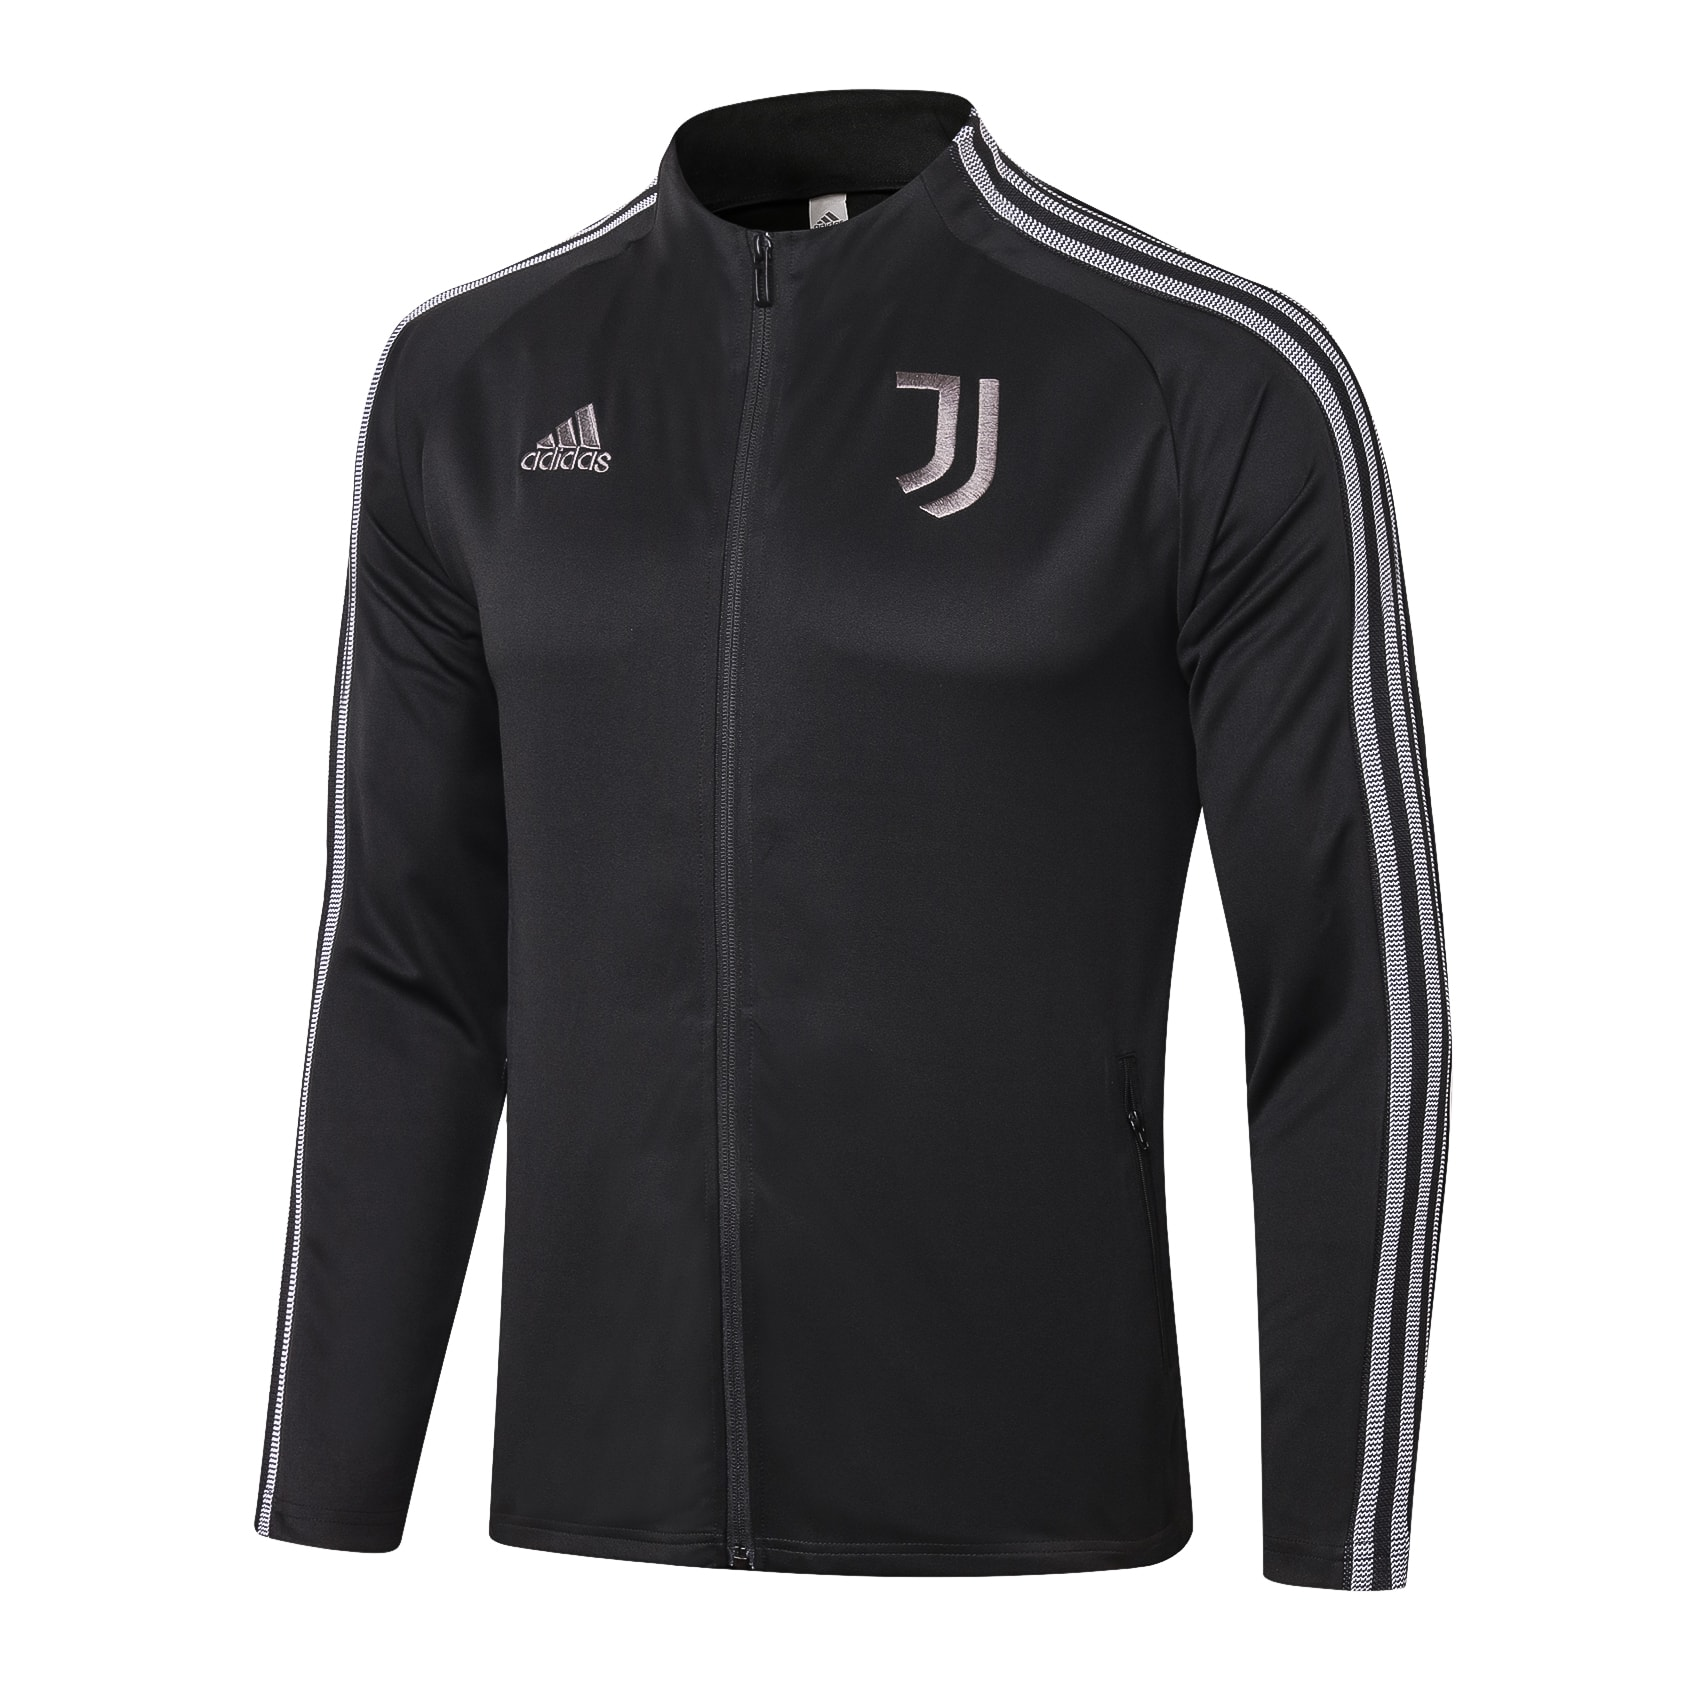 JAQUETA DE TREINO JUVENTUS FC 2021